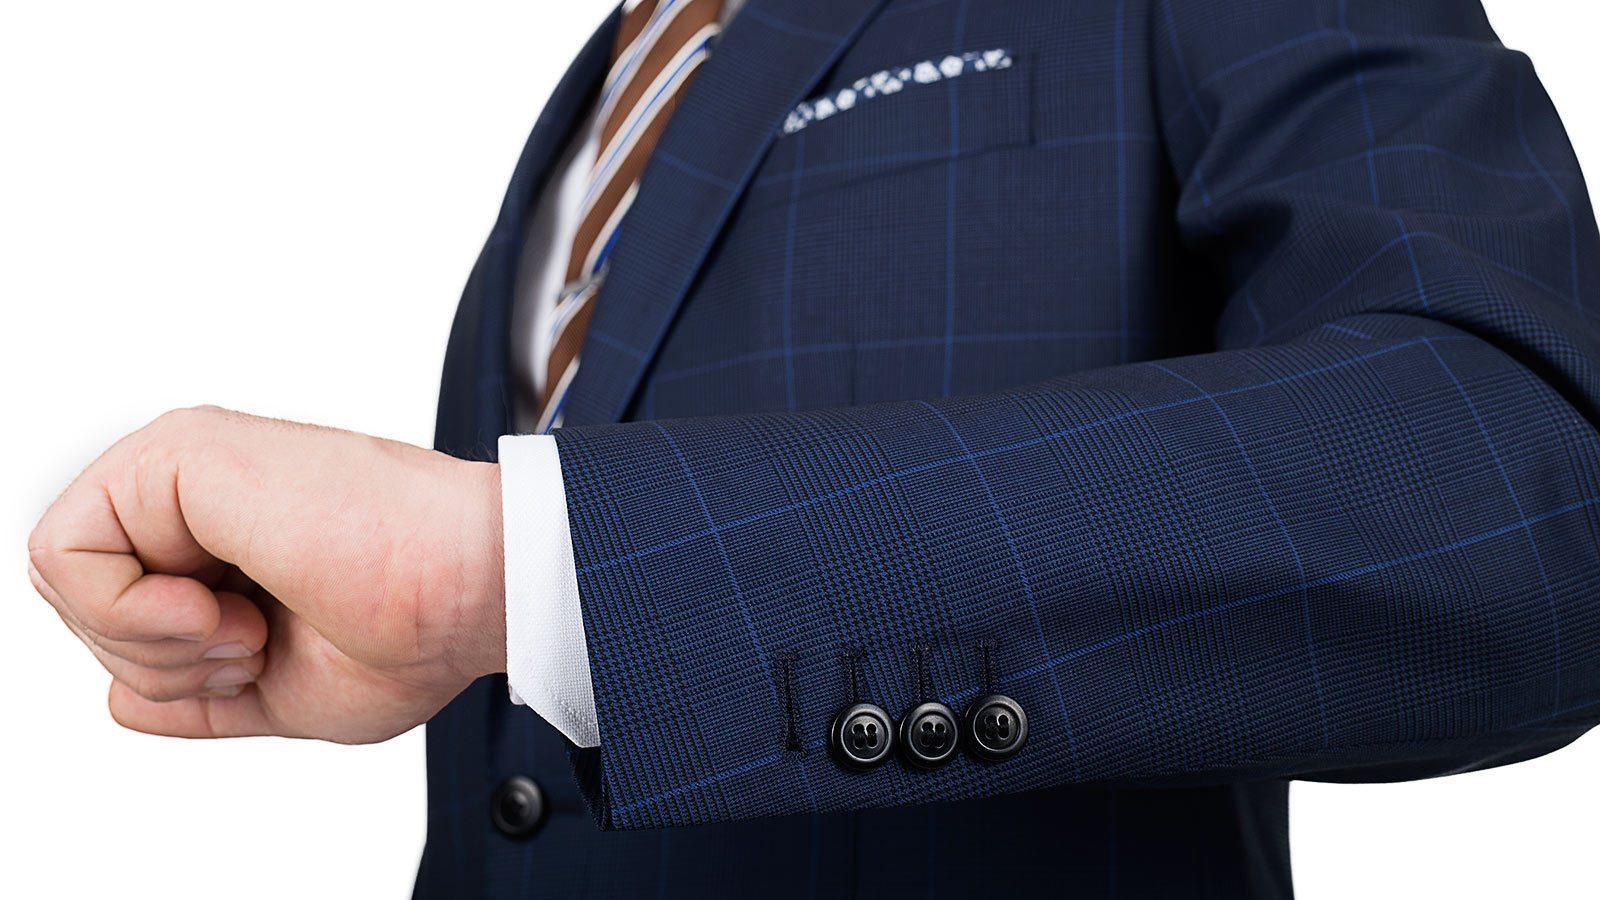 Premium Navy & Blue Plaid Suit - slider image 1